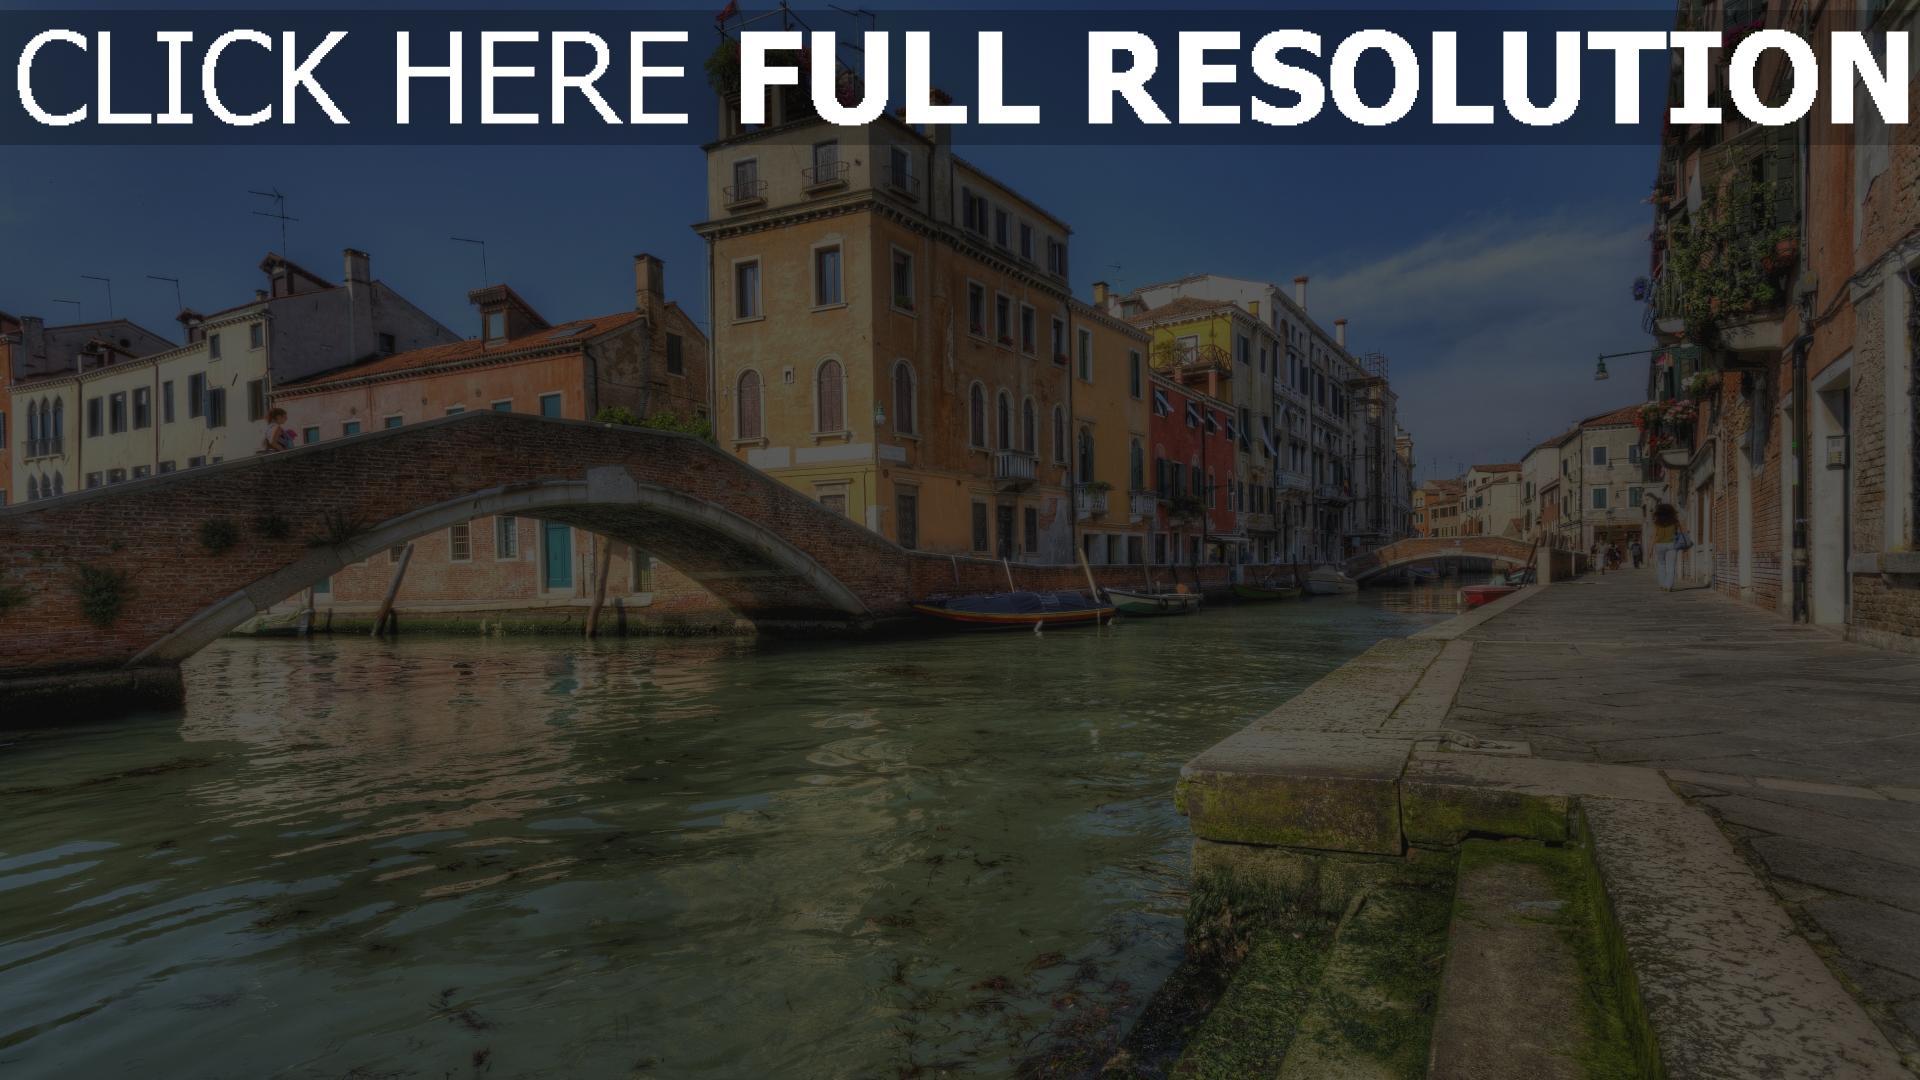 Häuser Italien hd hintergrundbilder fluss brücke venedig häuser italien desktop